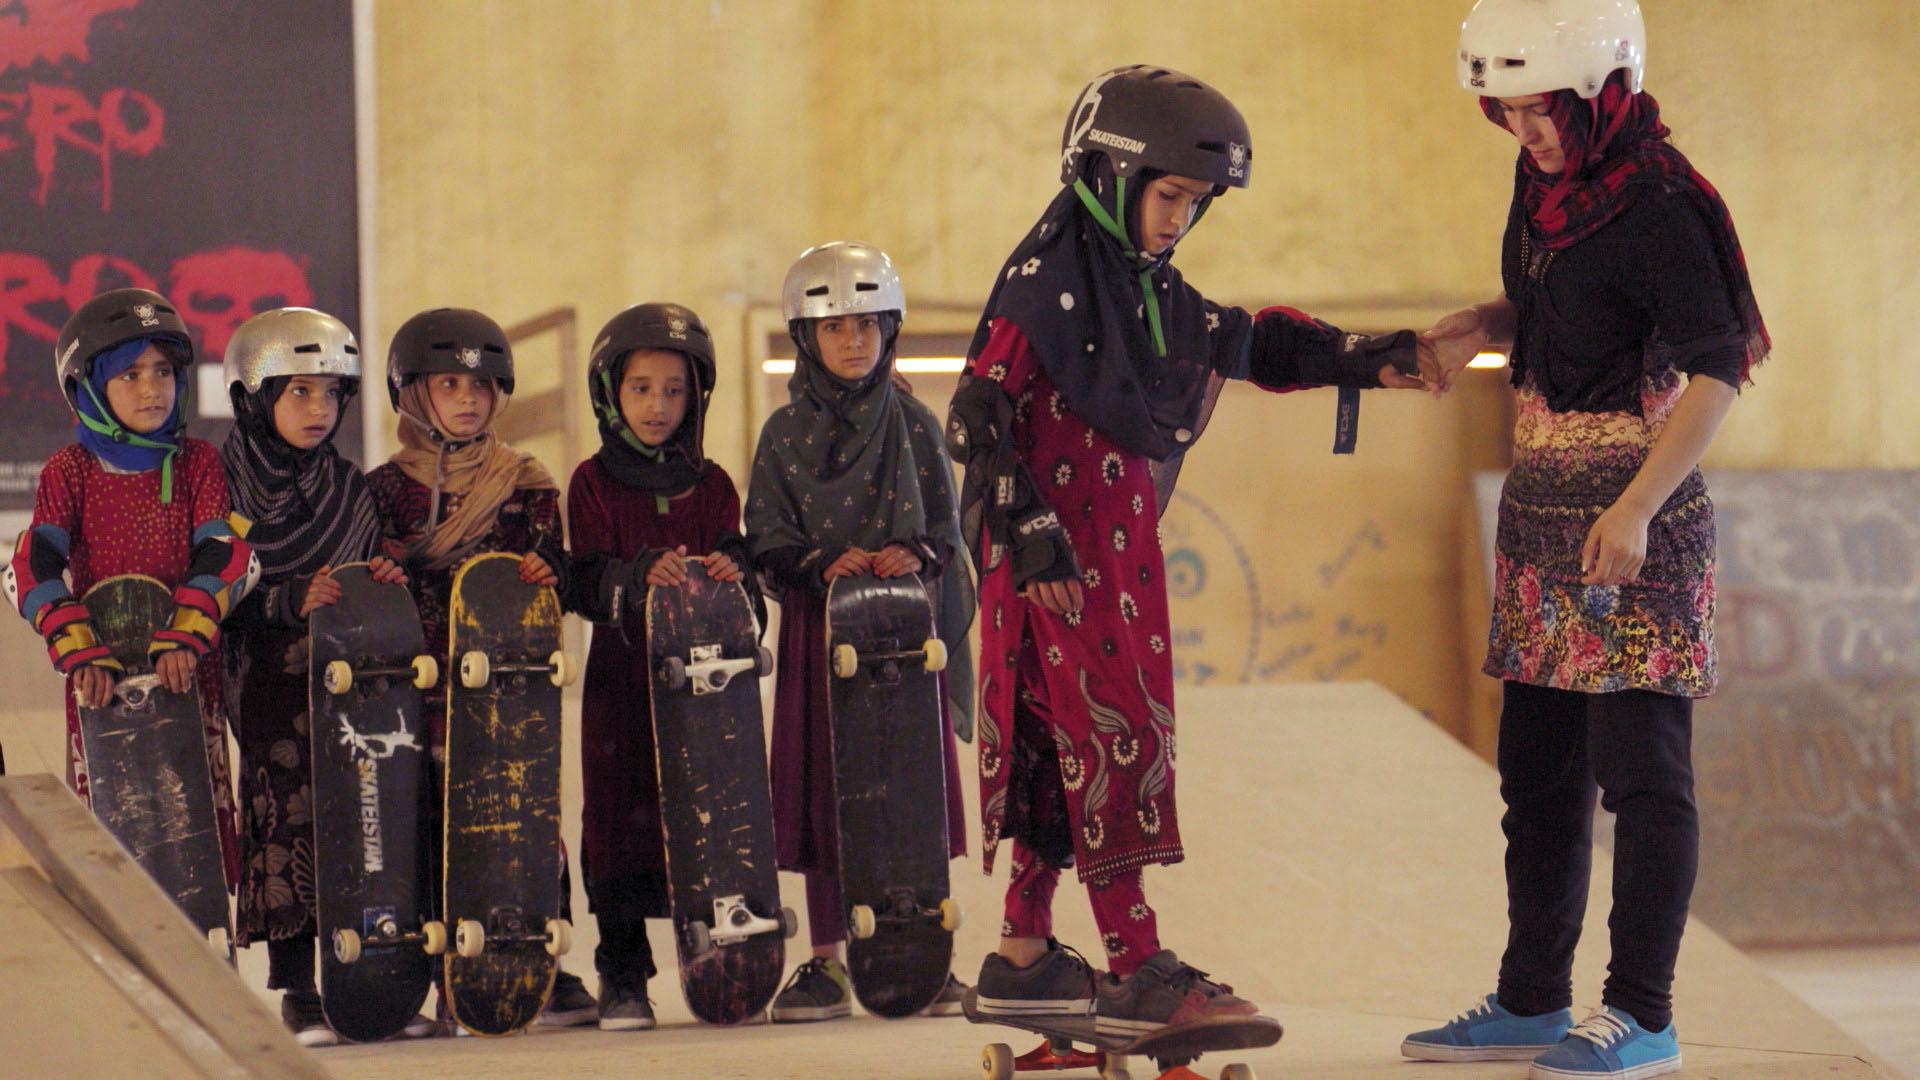 Baftas 2020: Short film nominees review